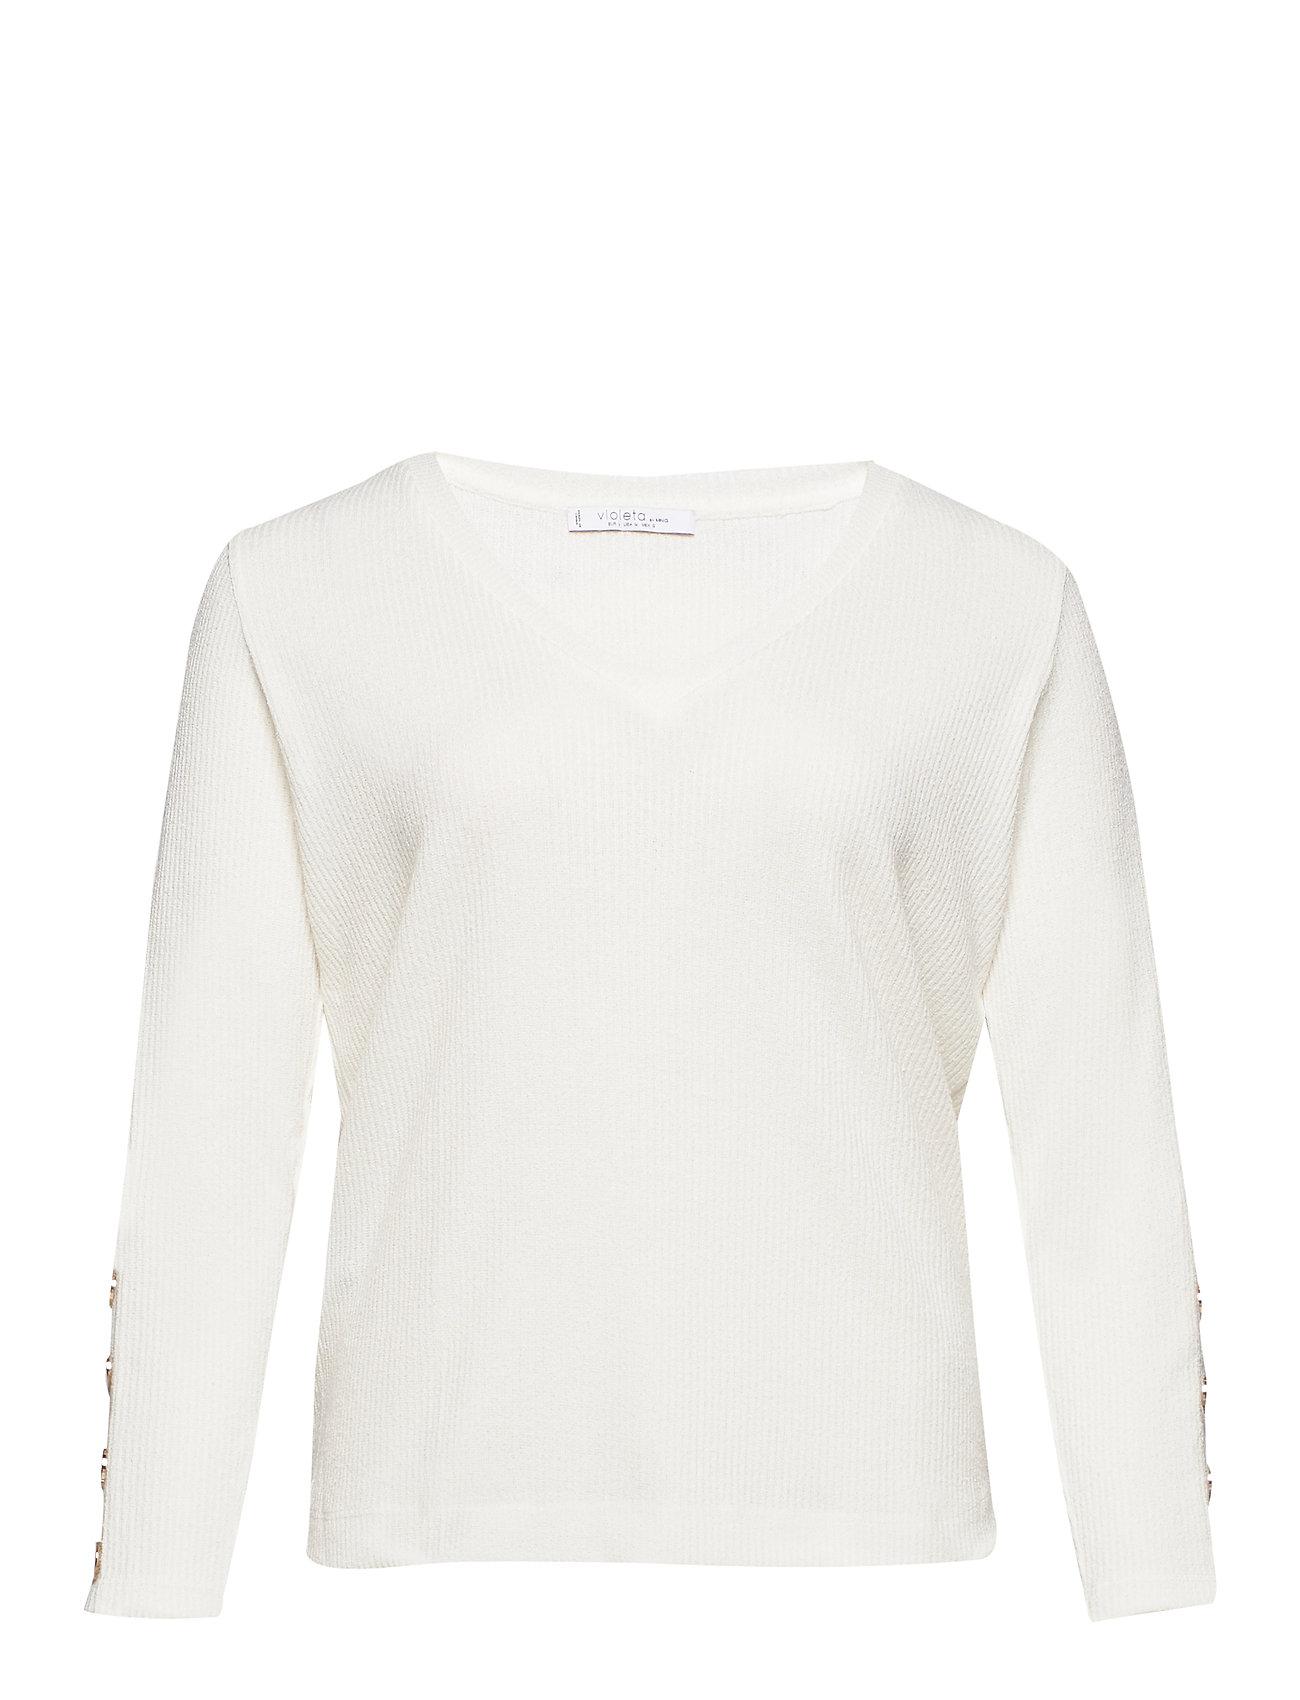 Violeta by Mango Buttoned cuffs t-shirt - NATURAL WHITE